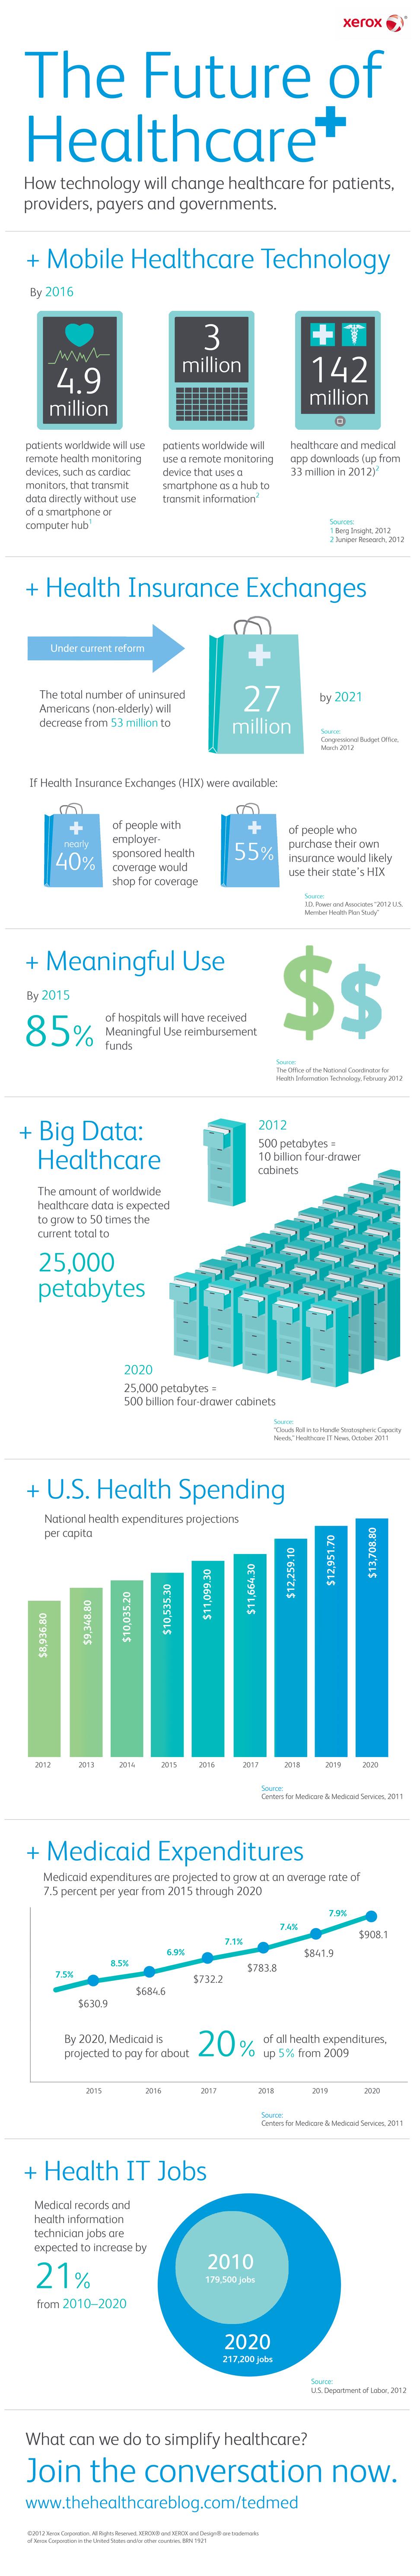 xerox health insurance  Xerox Healthcare Infographic Image